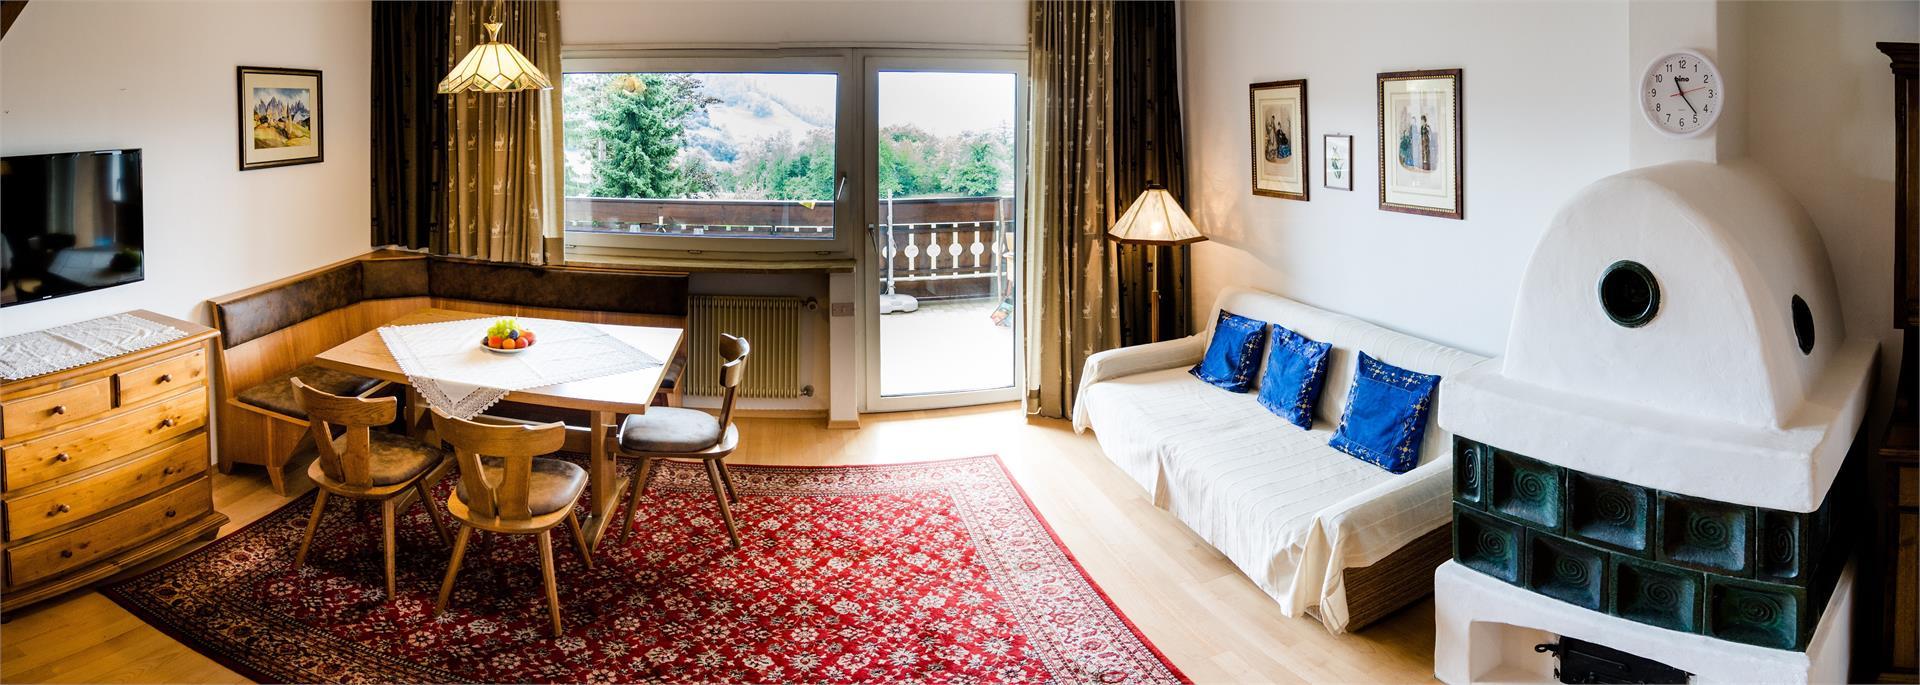 Apartment Matilde - Völs am Schlern - Südtirol